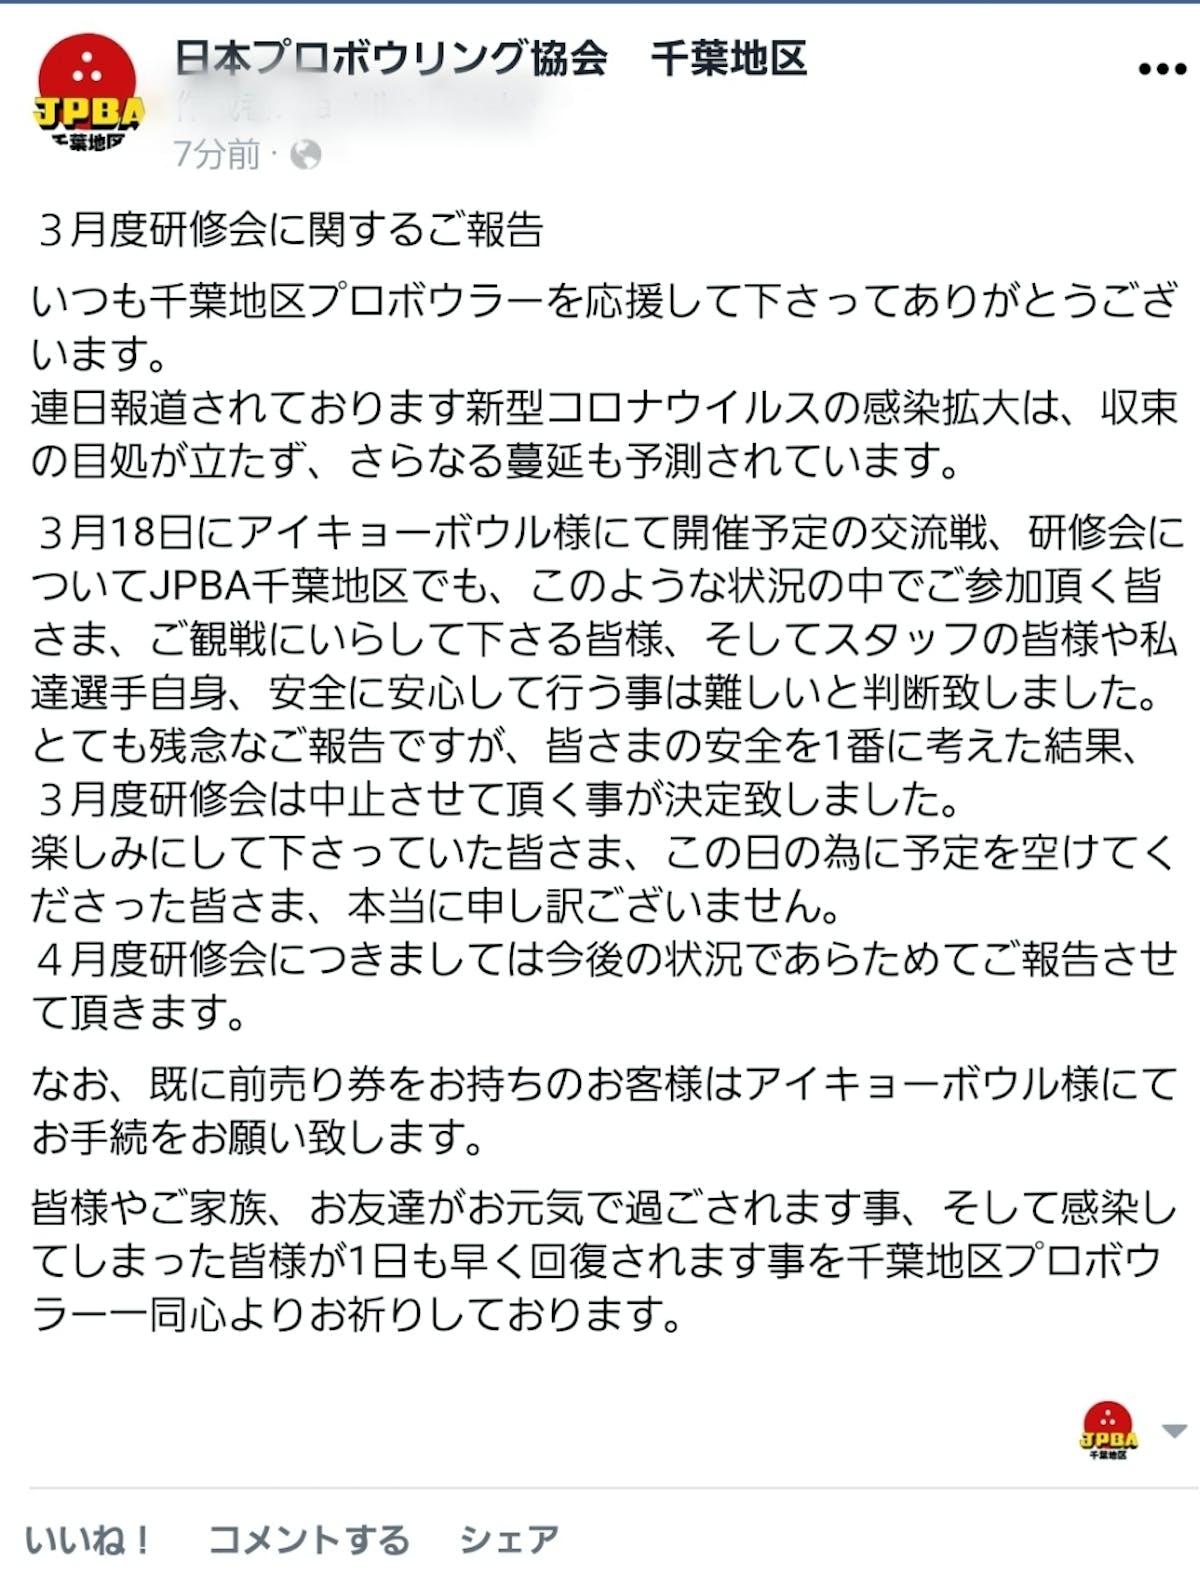 20-03-01-18-03-04-445_deco.jpg